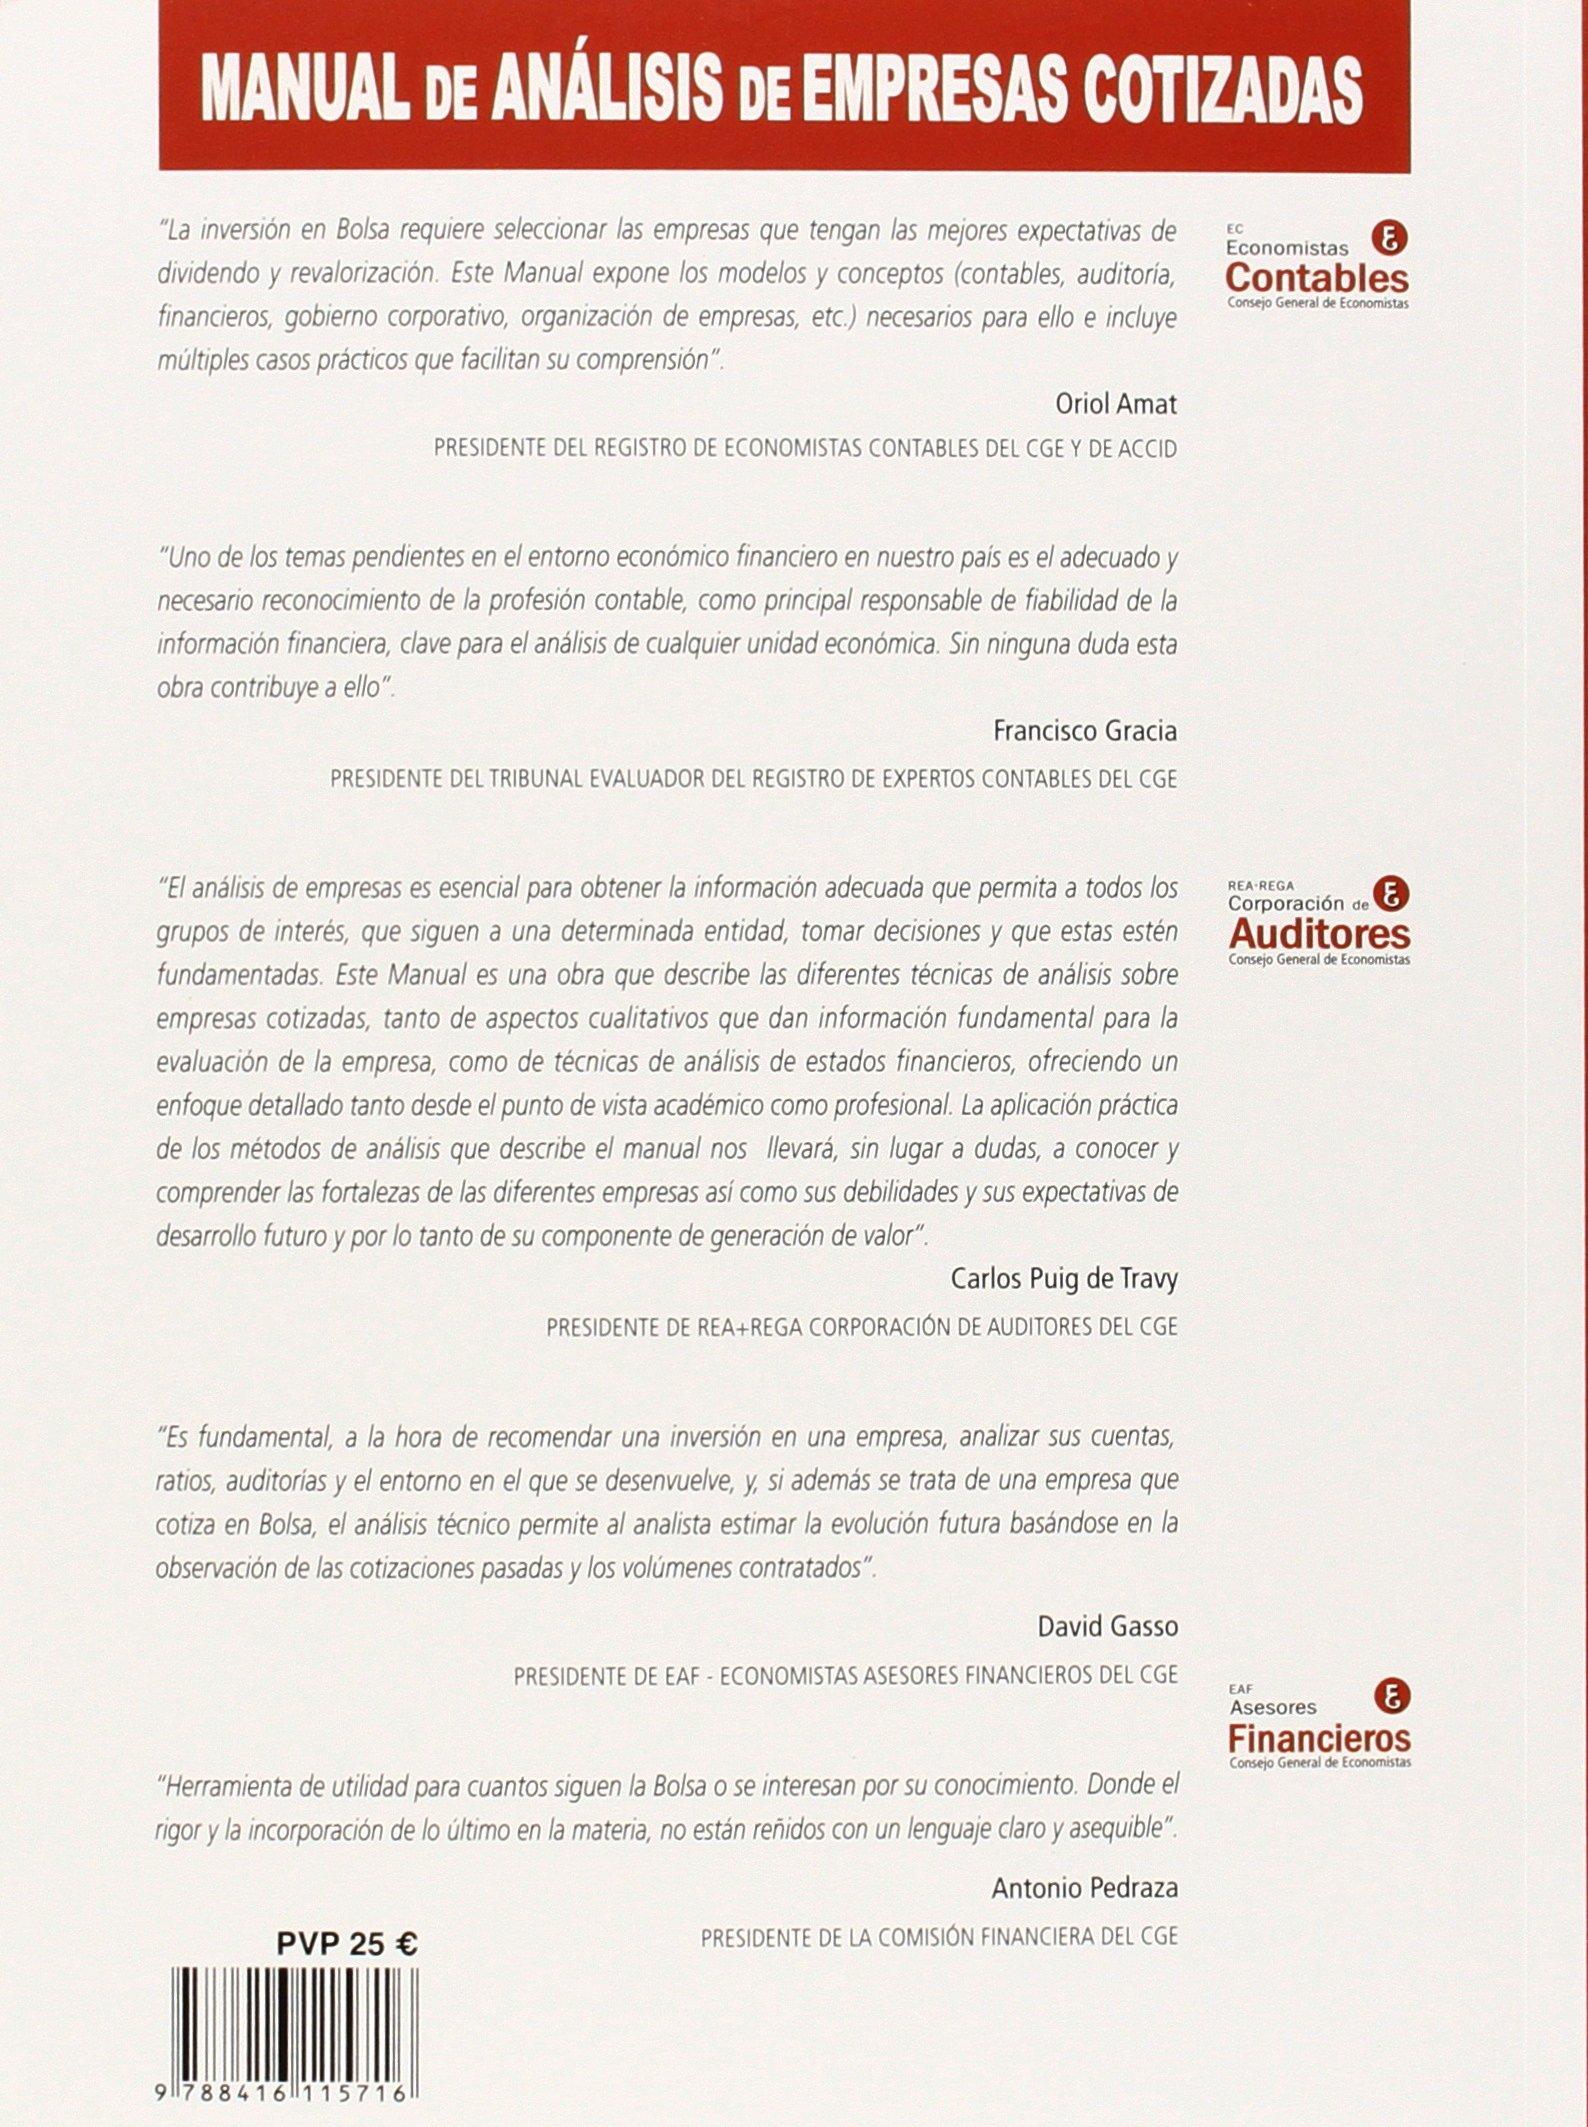 Manual de análisis de empresas cotizadas: Oriol Amat; Victoria Nombela: 9788416115716: Amazon.com: Books